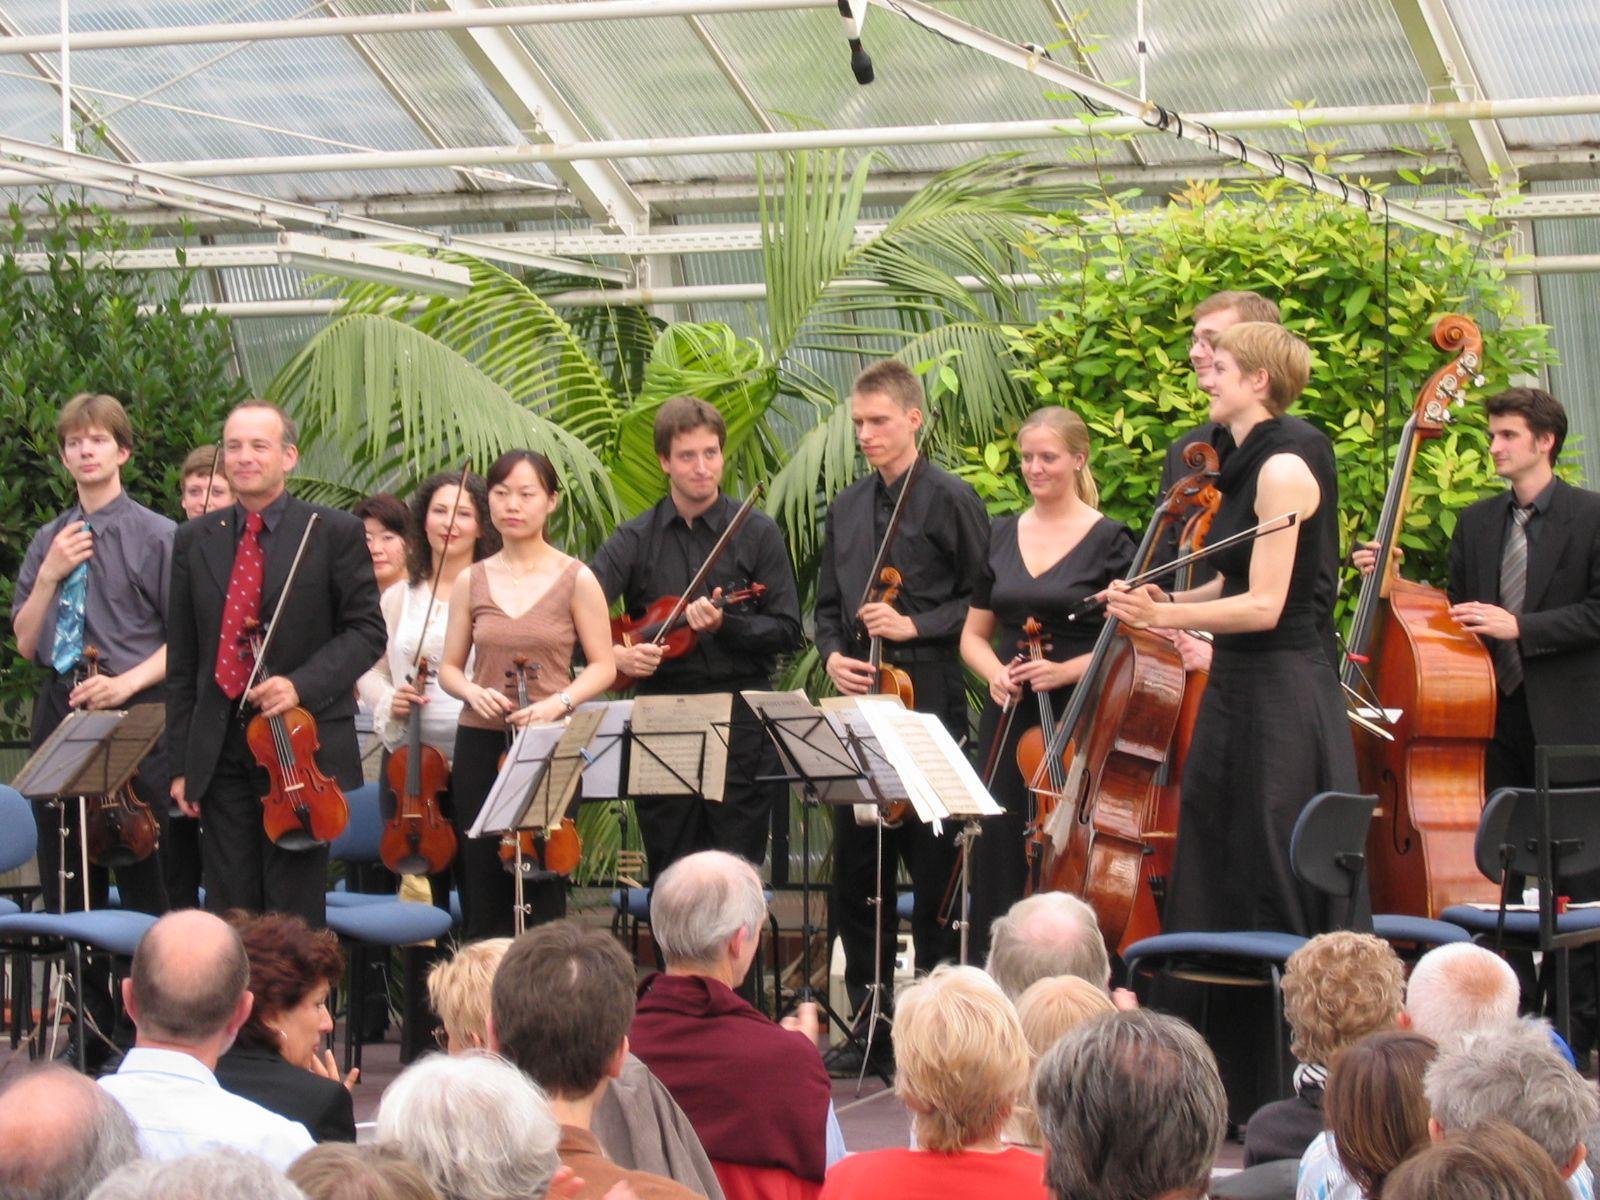 Academy concert in the Berlin Botanical Garden